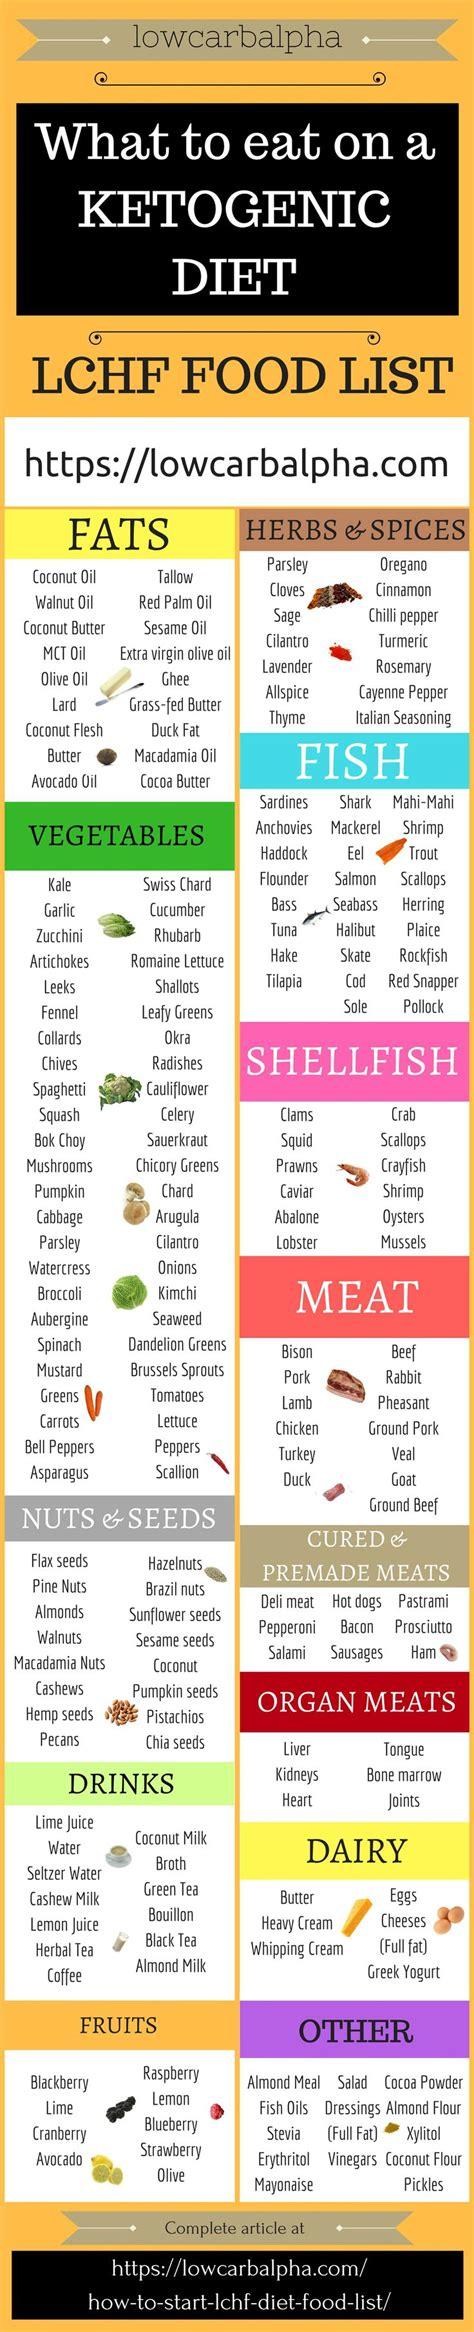 cuisine diet 25 best ideas about keto diet foods on keto